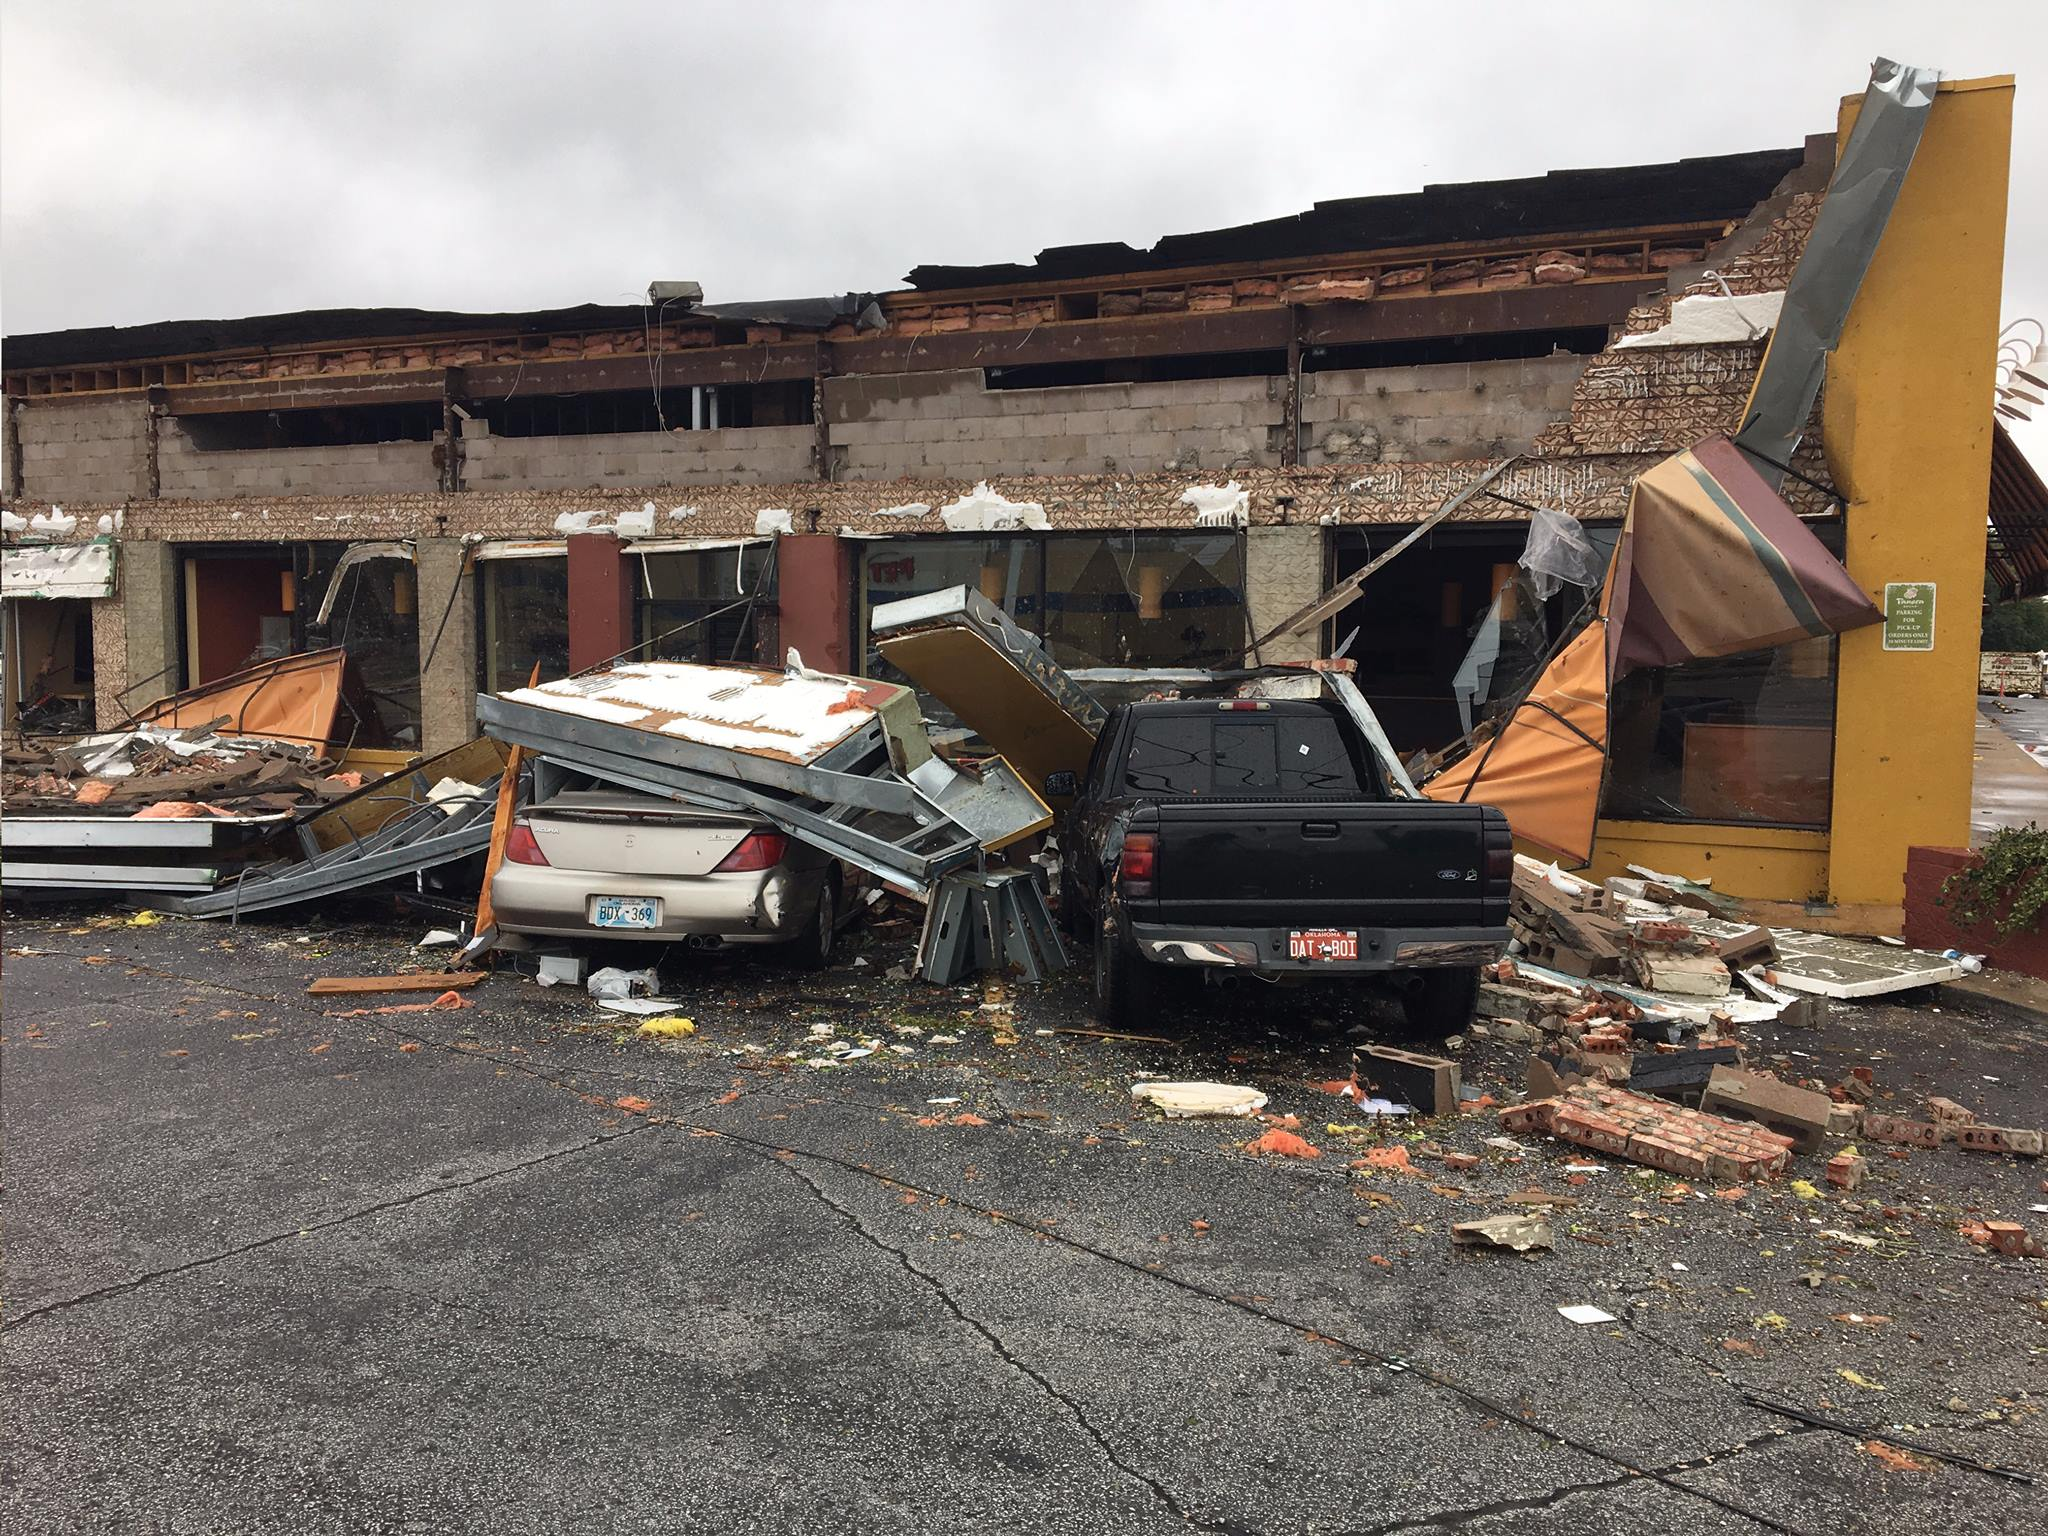 Tornado damage from overnight storm in Tulsa 8-7-17